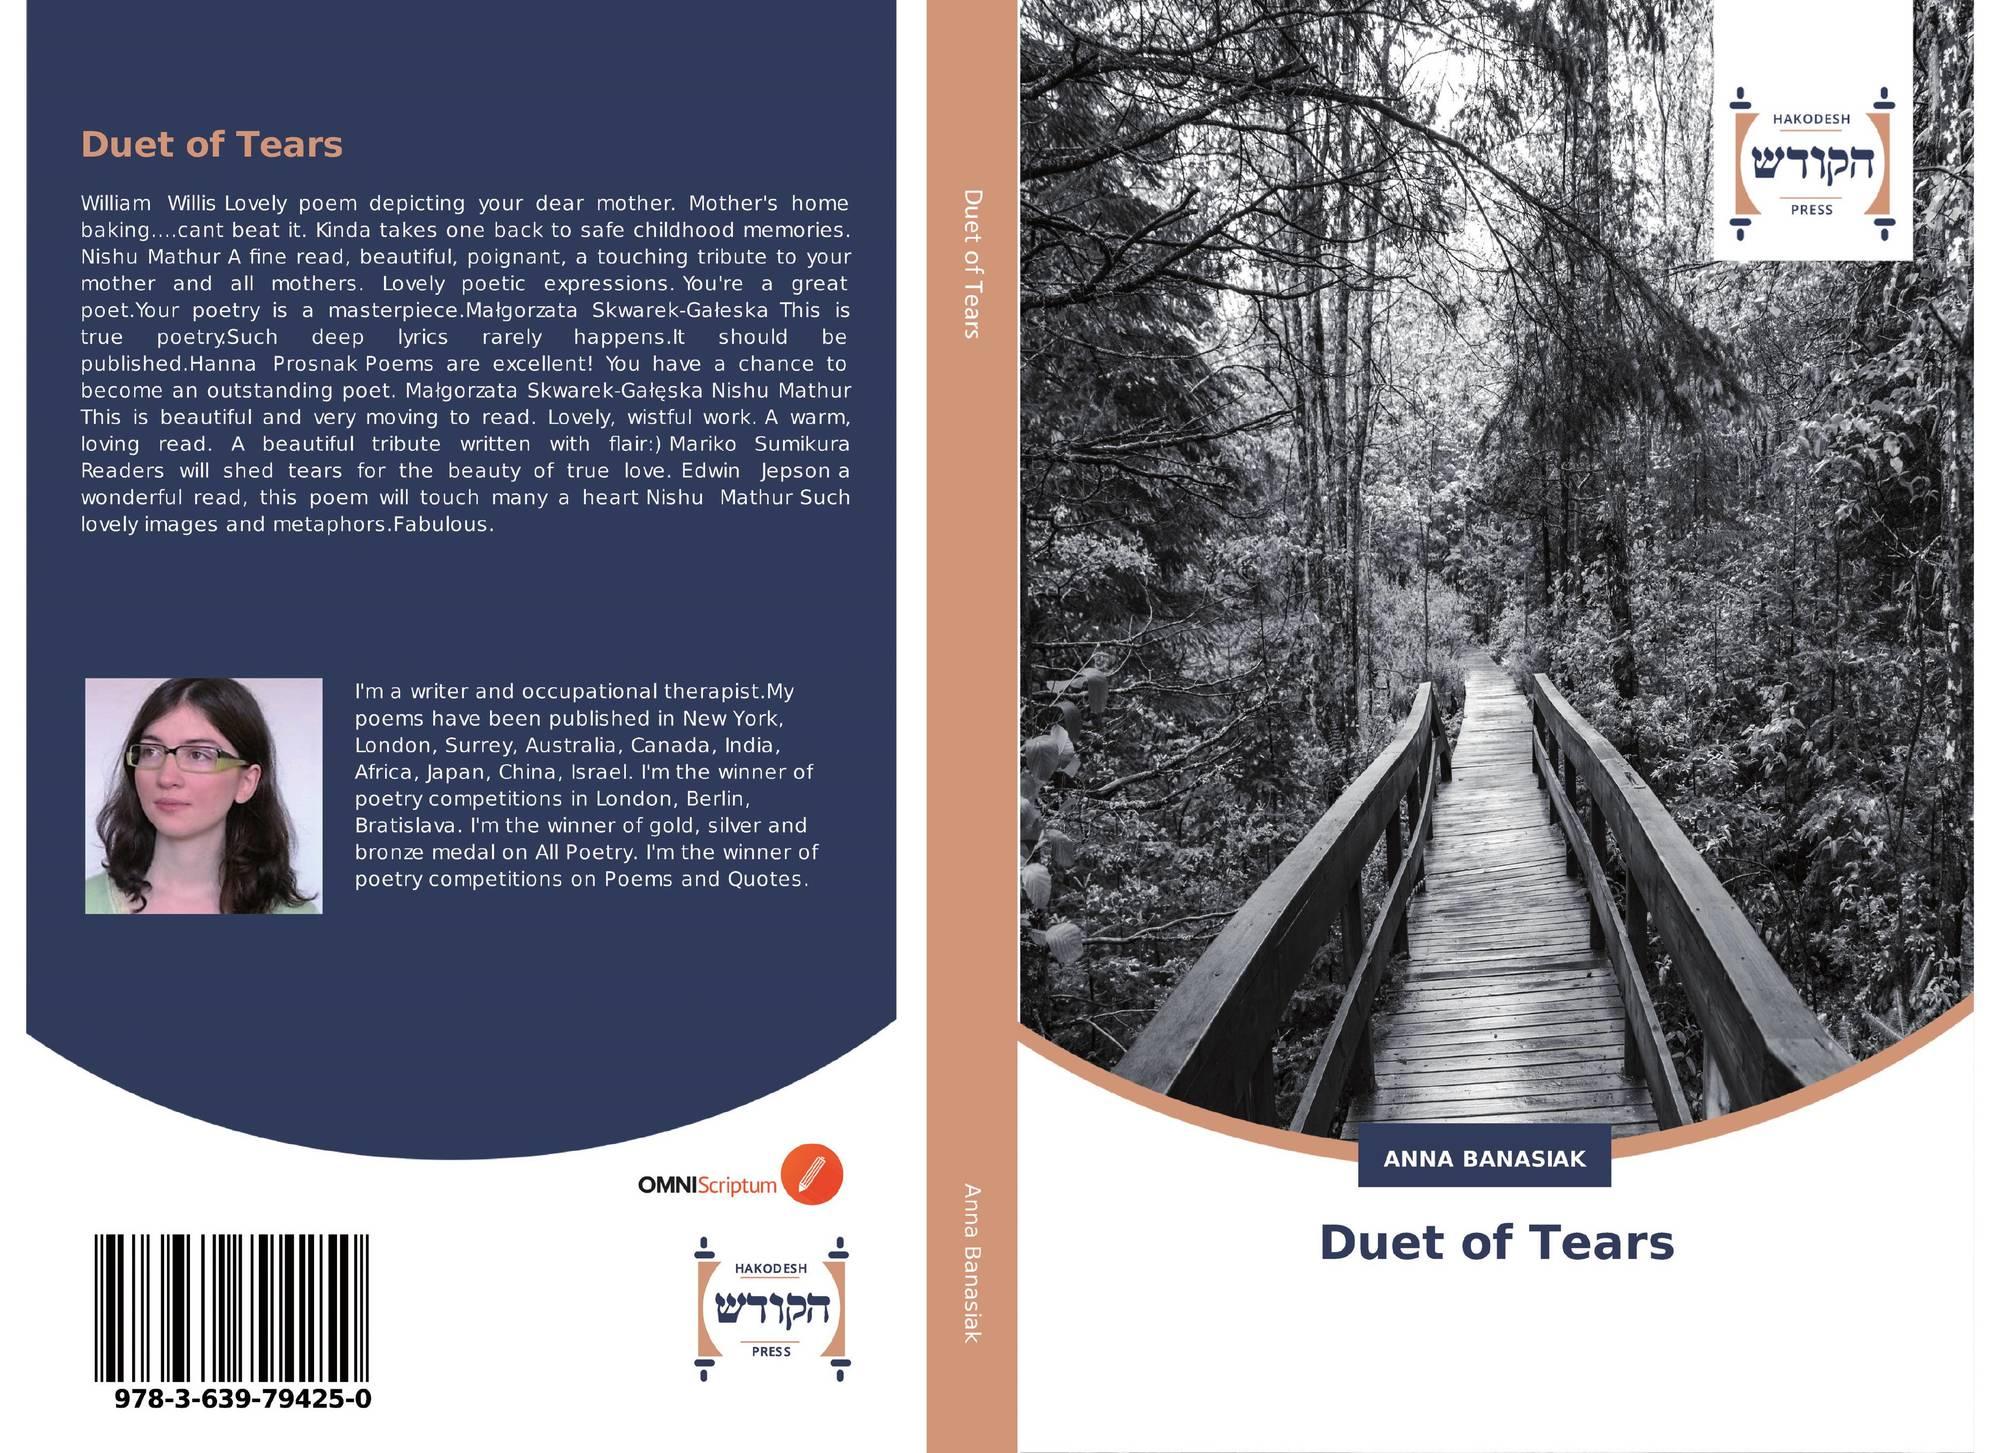 Duet of Tears, 978-3-639-79425-0, 3639794257 ,9783639794250